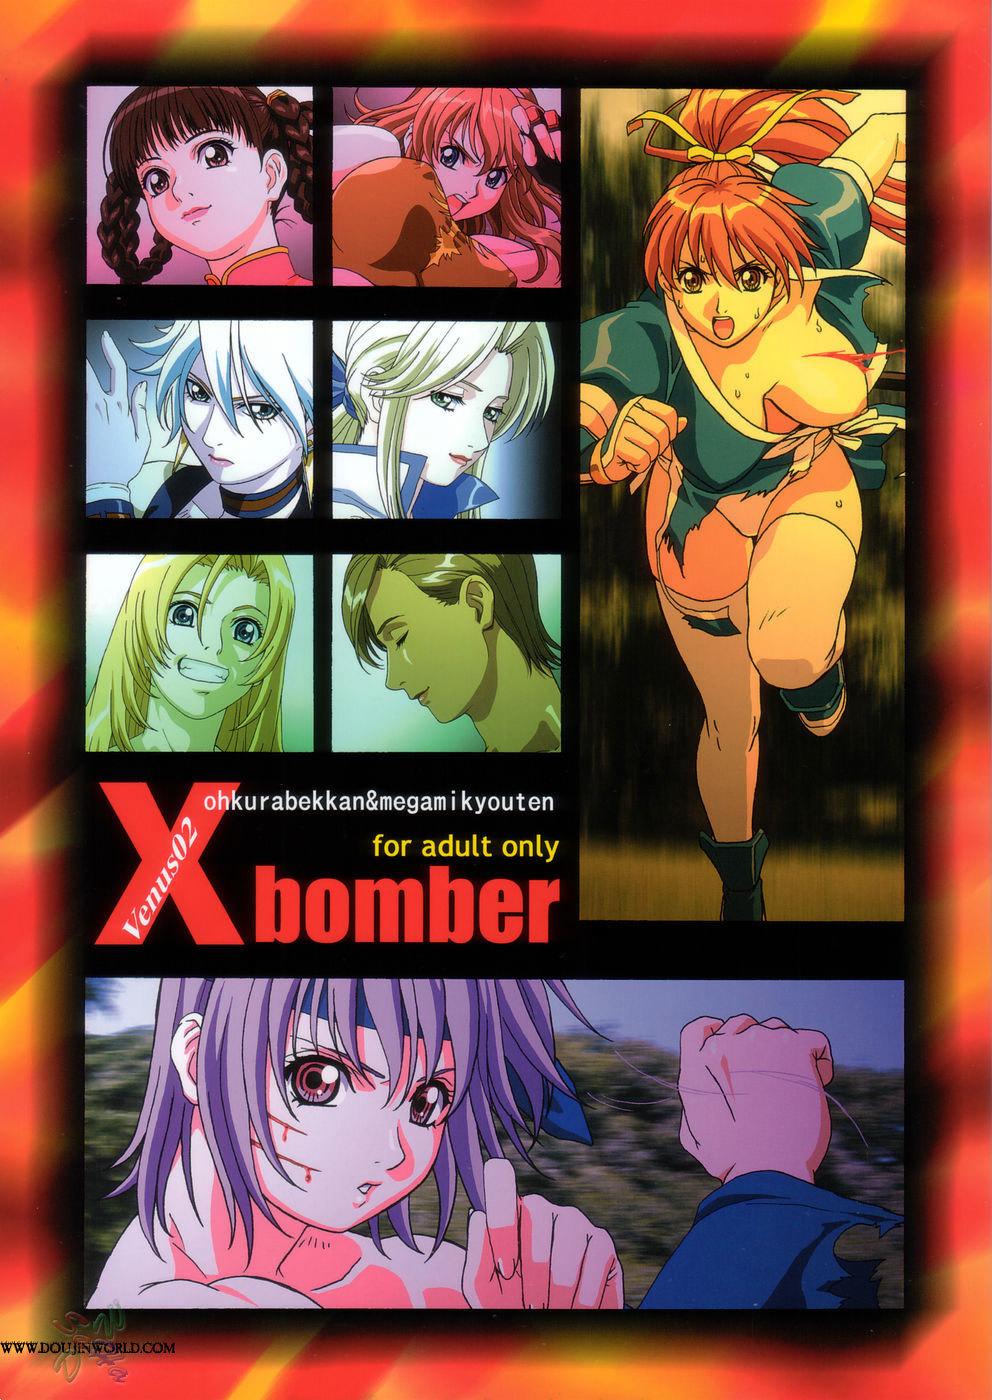 Venus02 X bomber- Dead or alive porn comics 8 muses